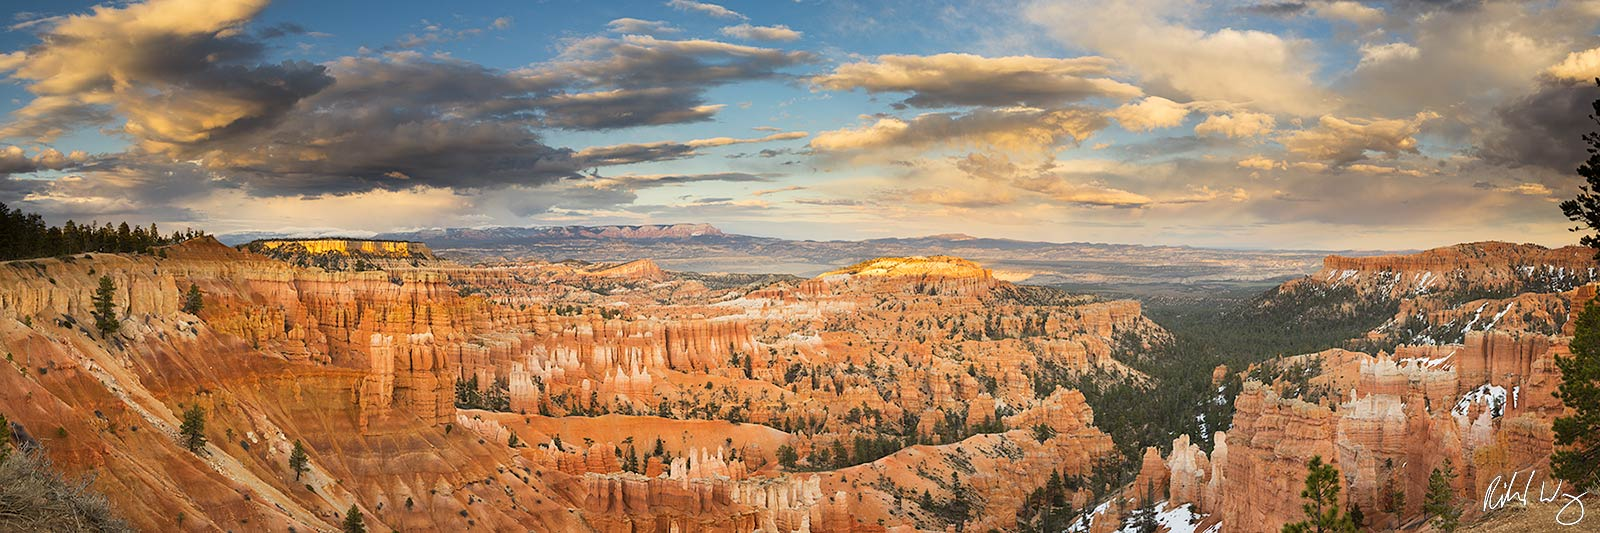 Sunset Point Panoramic, Bryce Canyon National Park, Utah